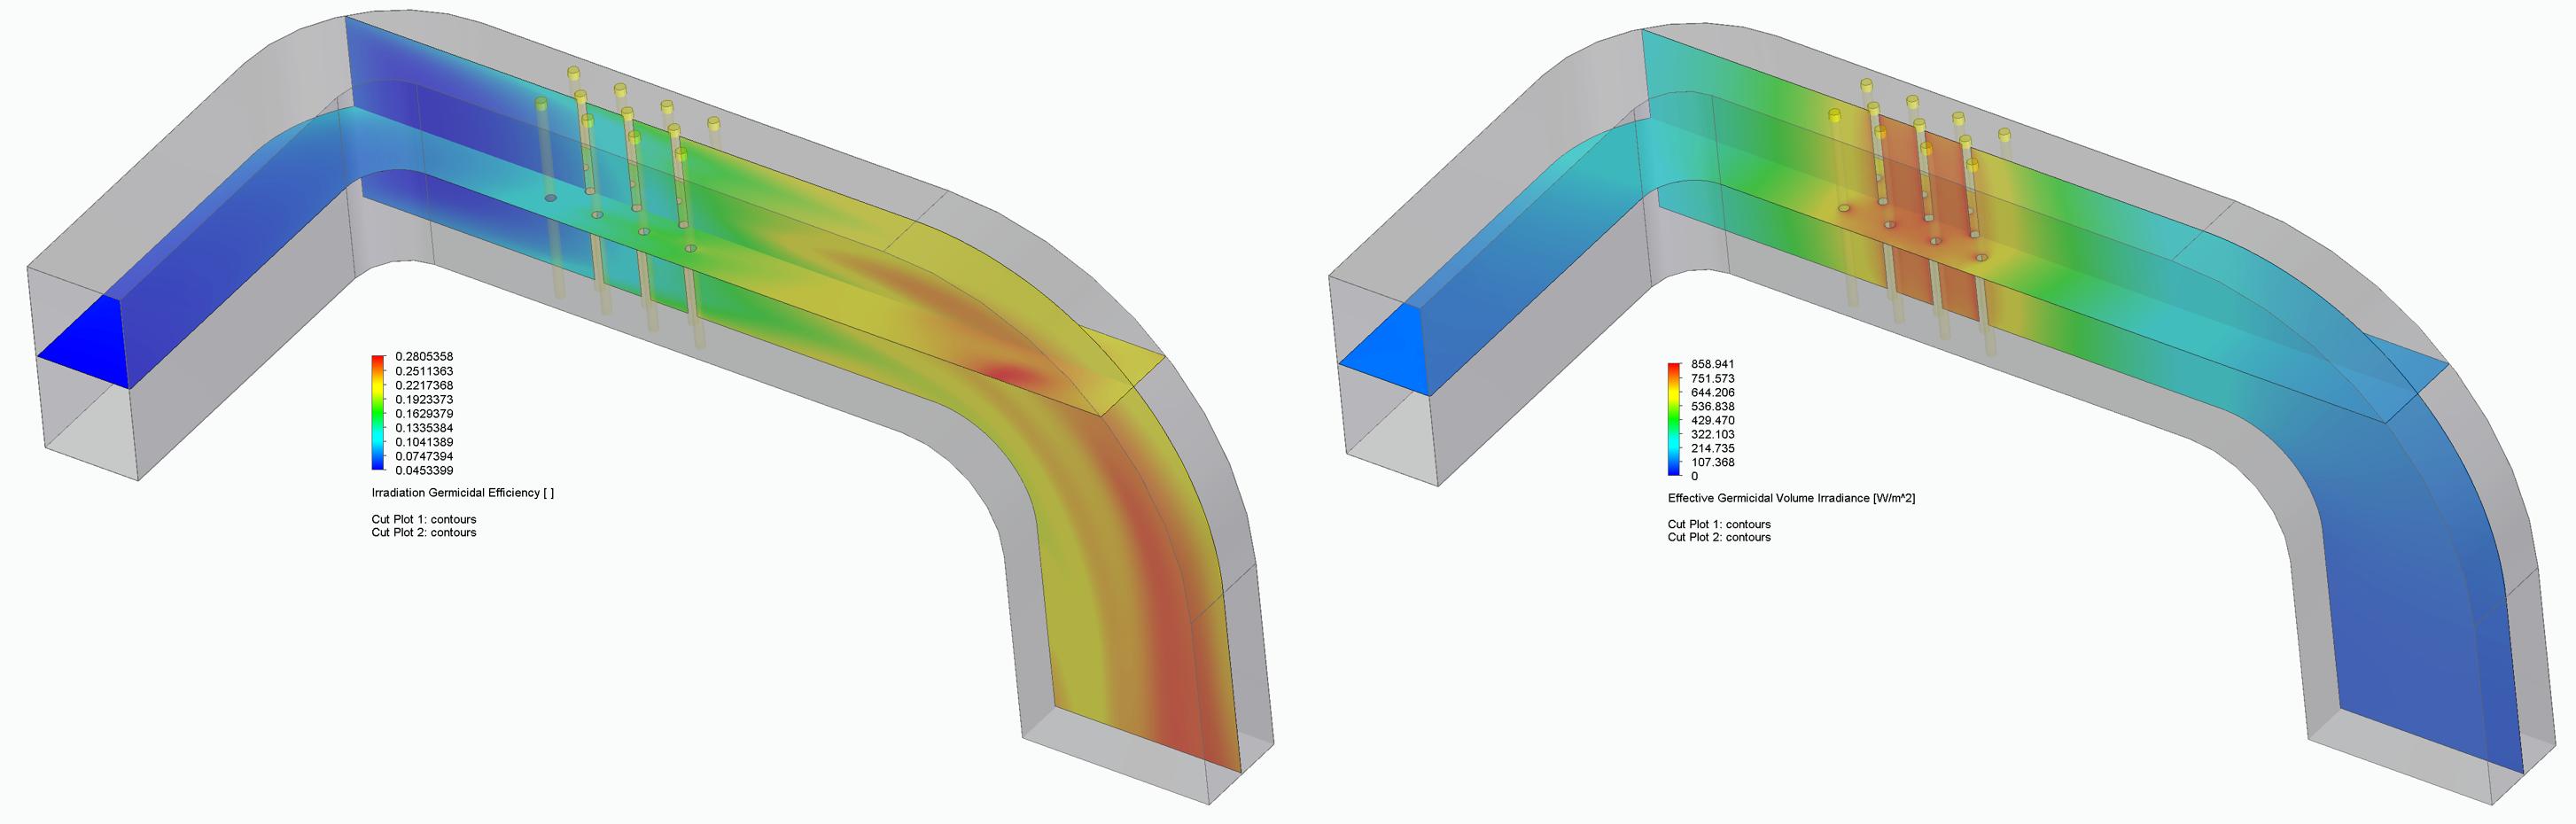 An HVAC duct with UVC sterilization simulation.